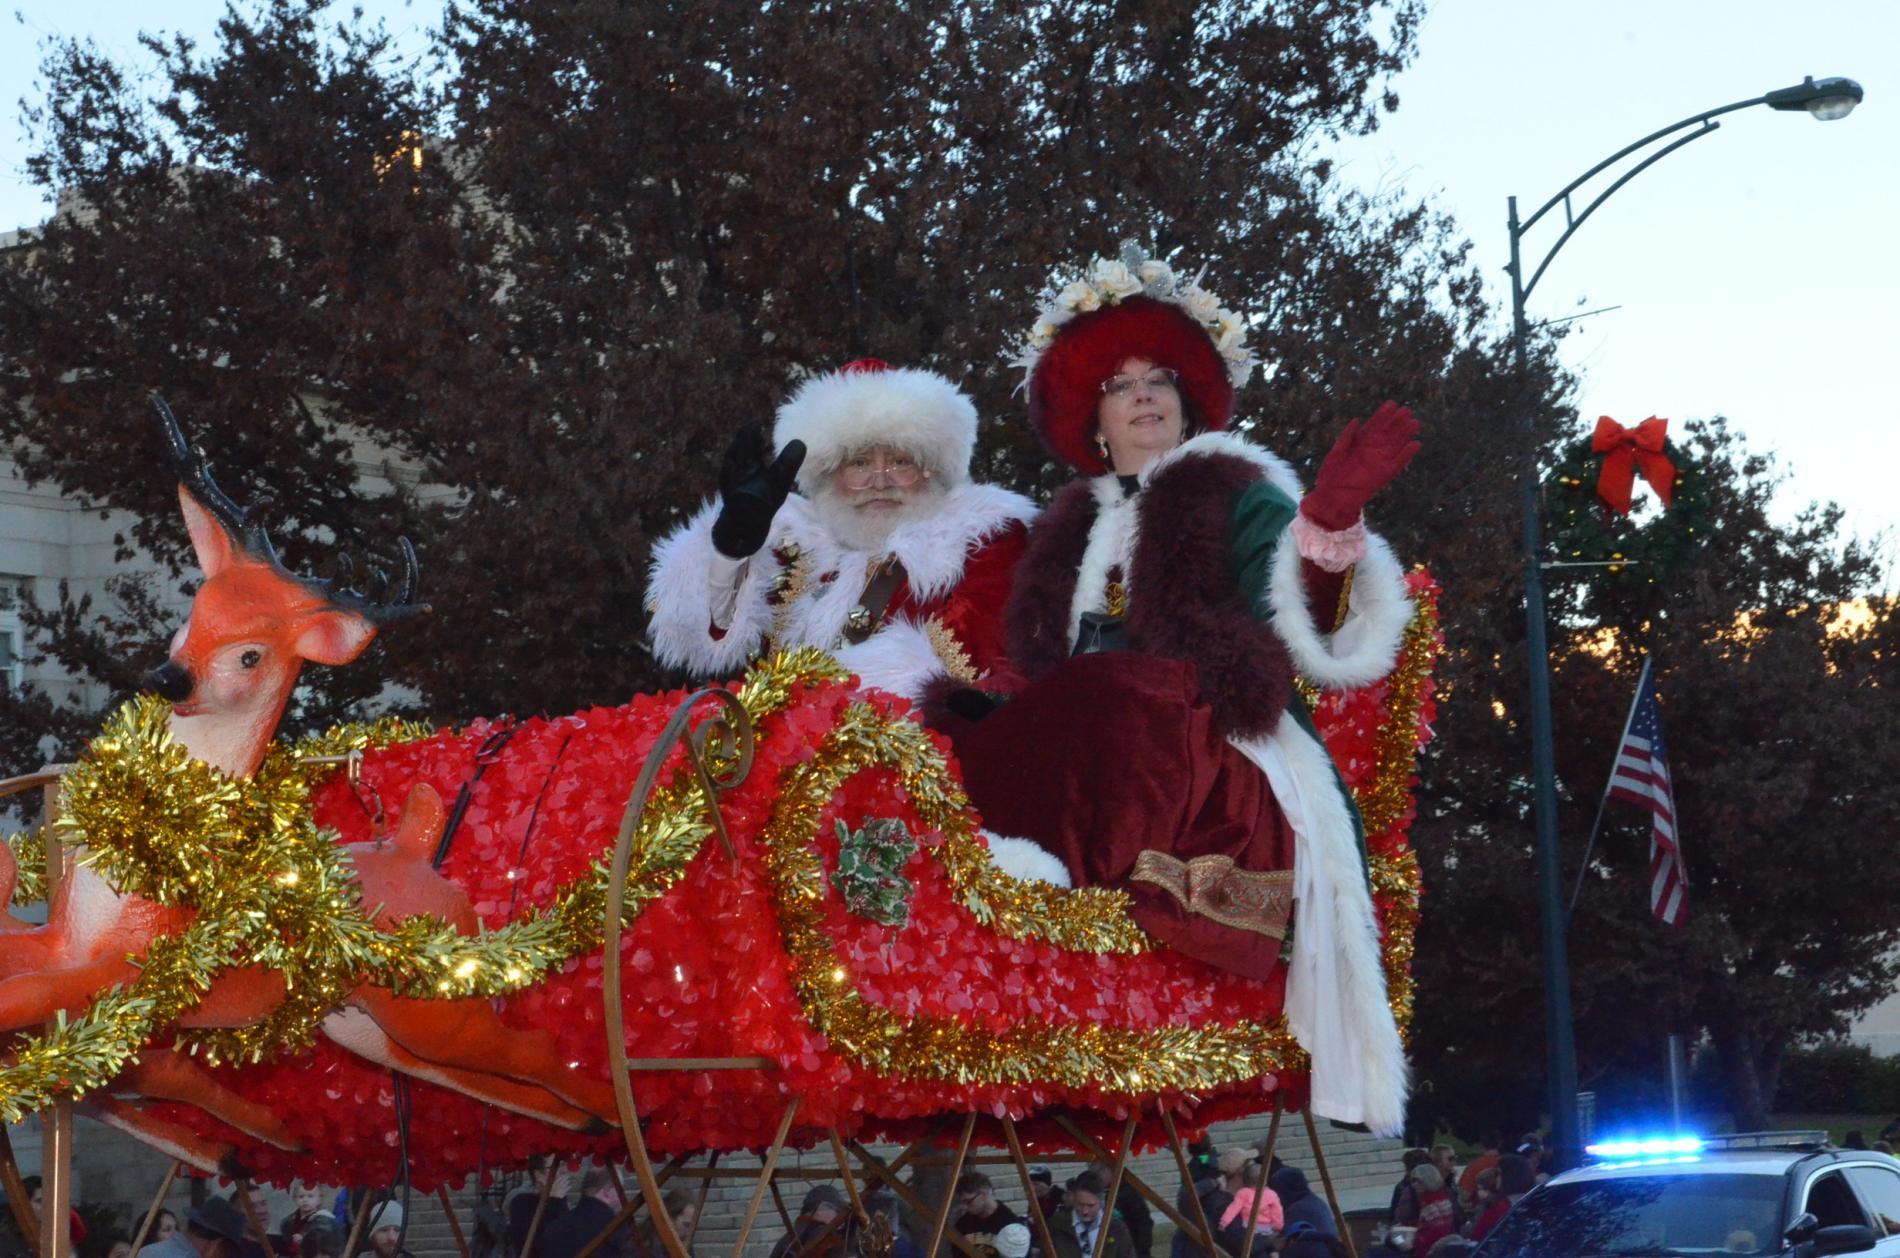 Salisbury Nc 2021 Christmas Parade Tis The Season Holiday Spectacular Parade Downtown Salisbury Inc